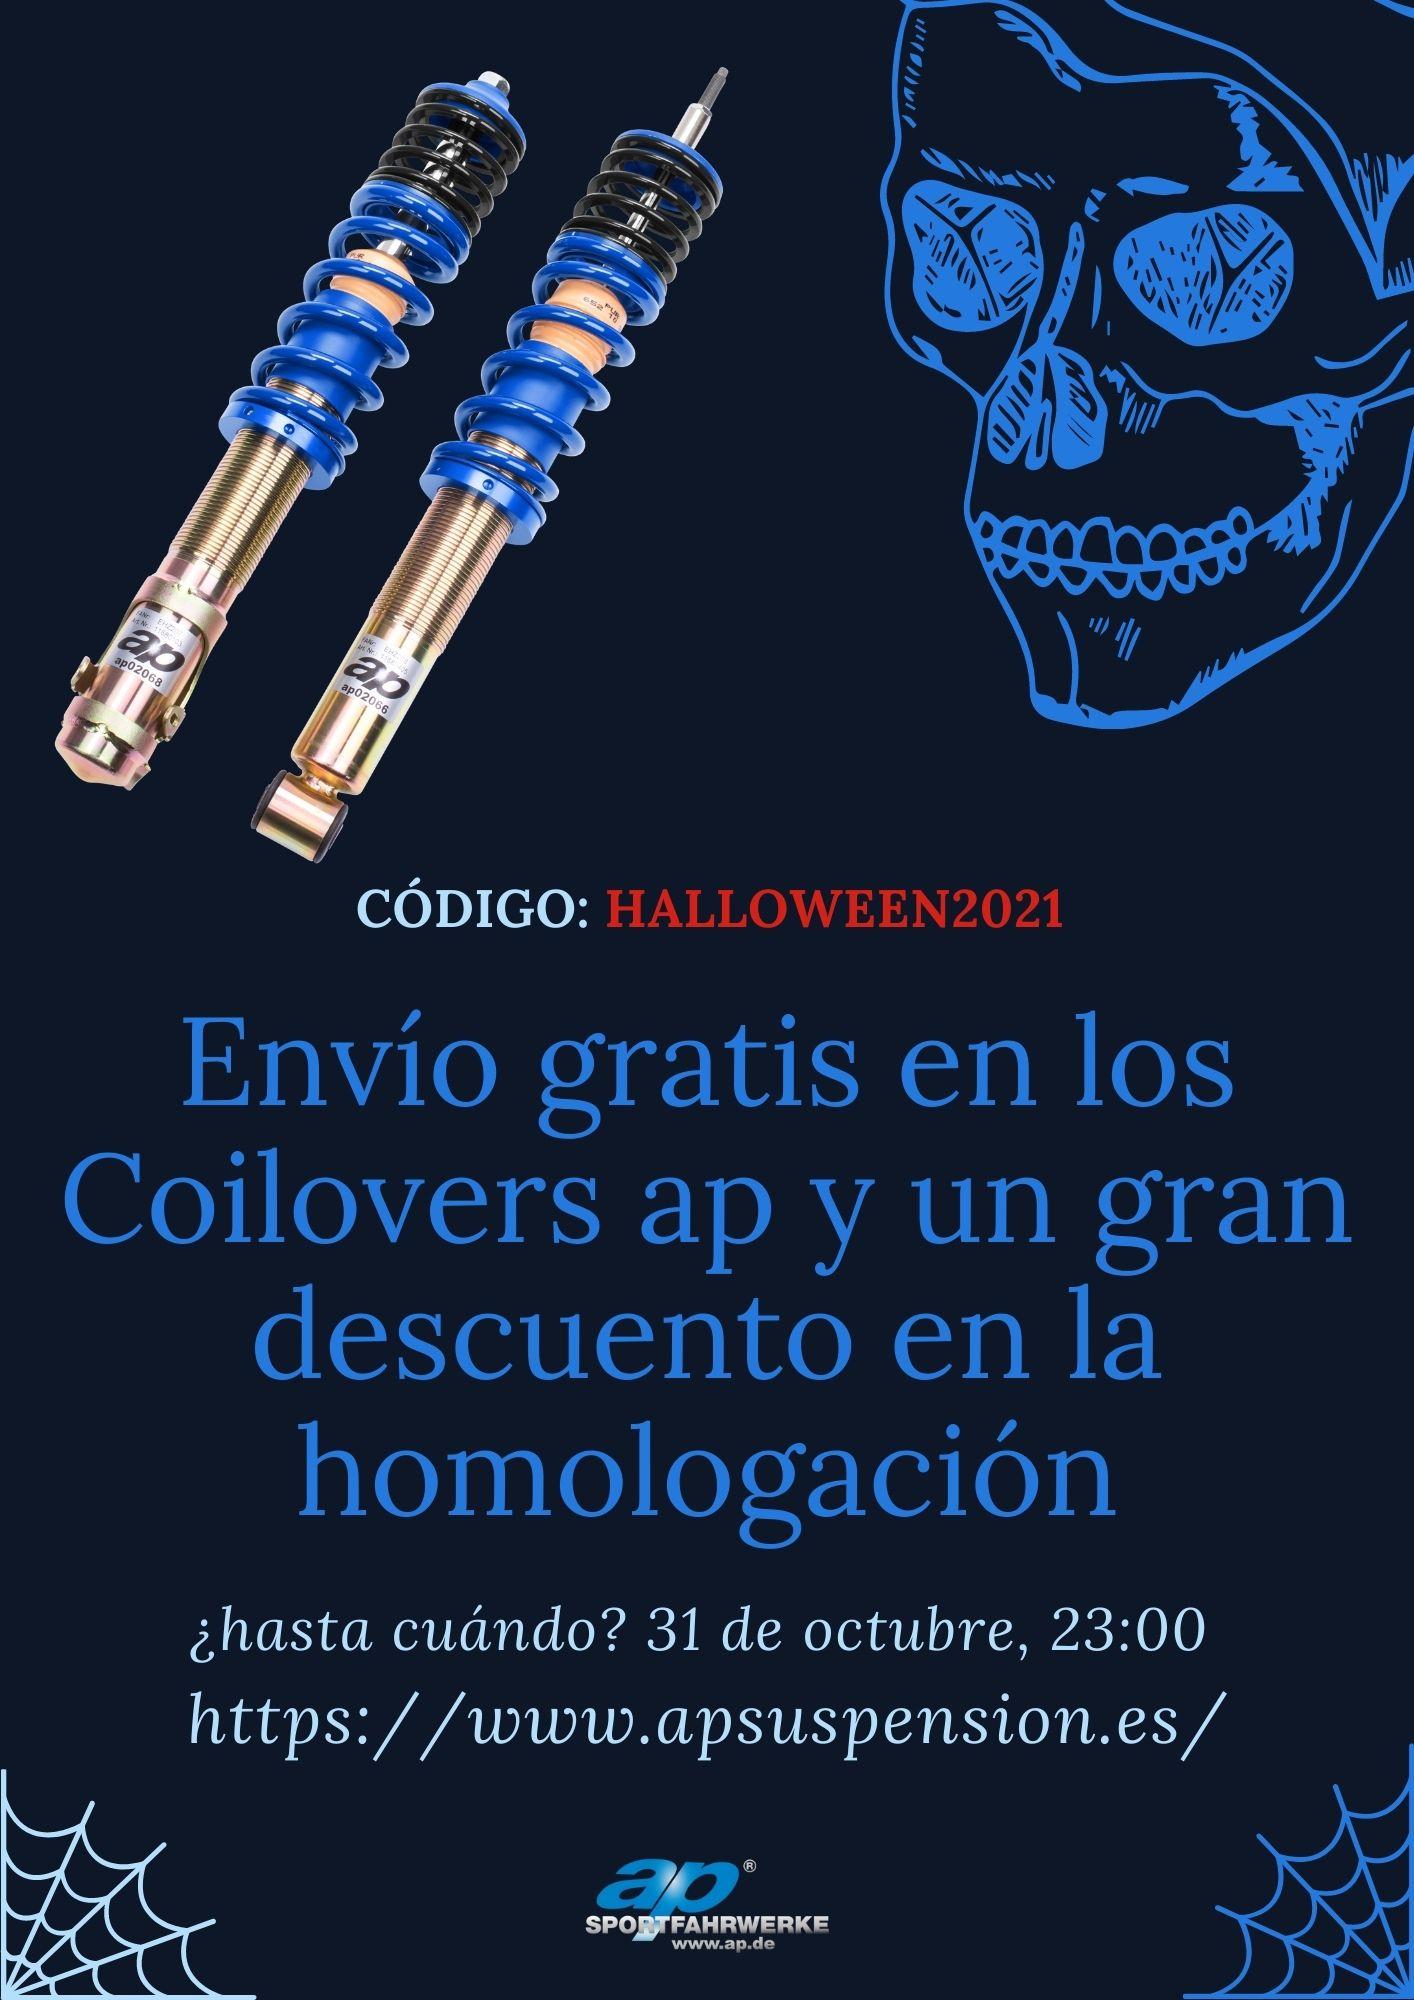 oferta halloween 2021 apsuspension.es